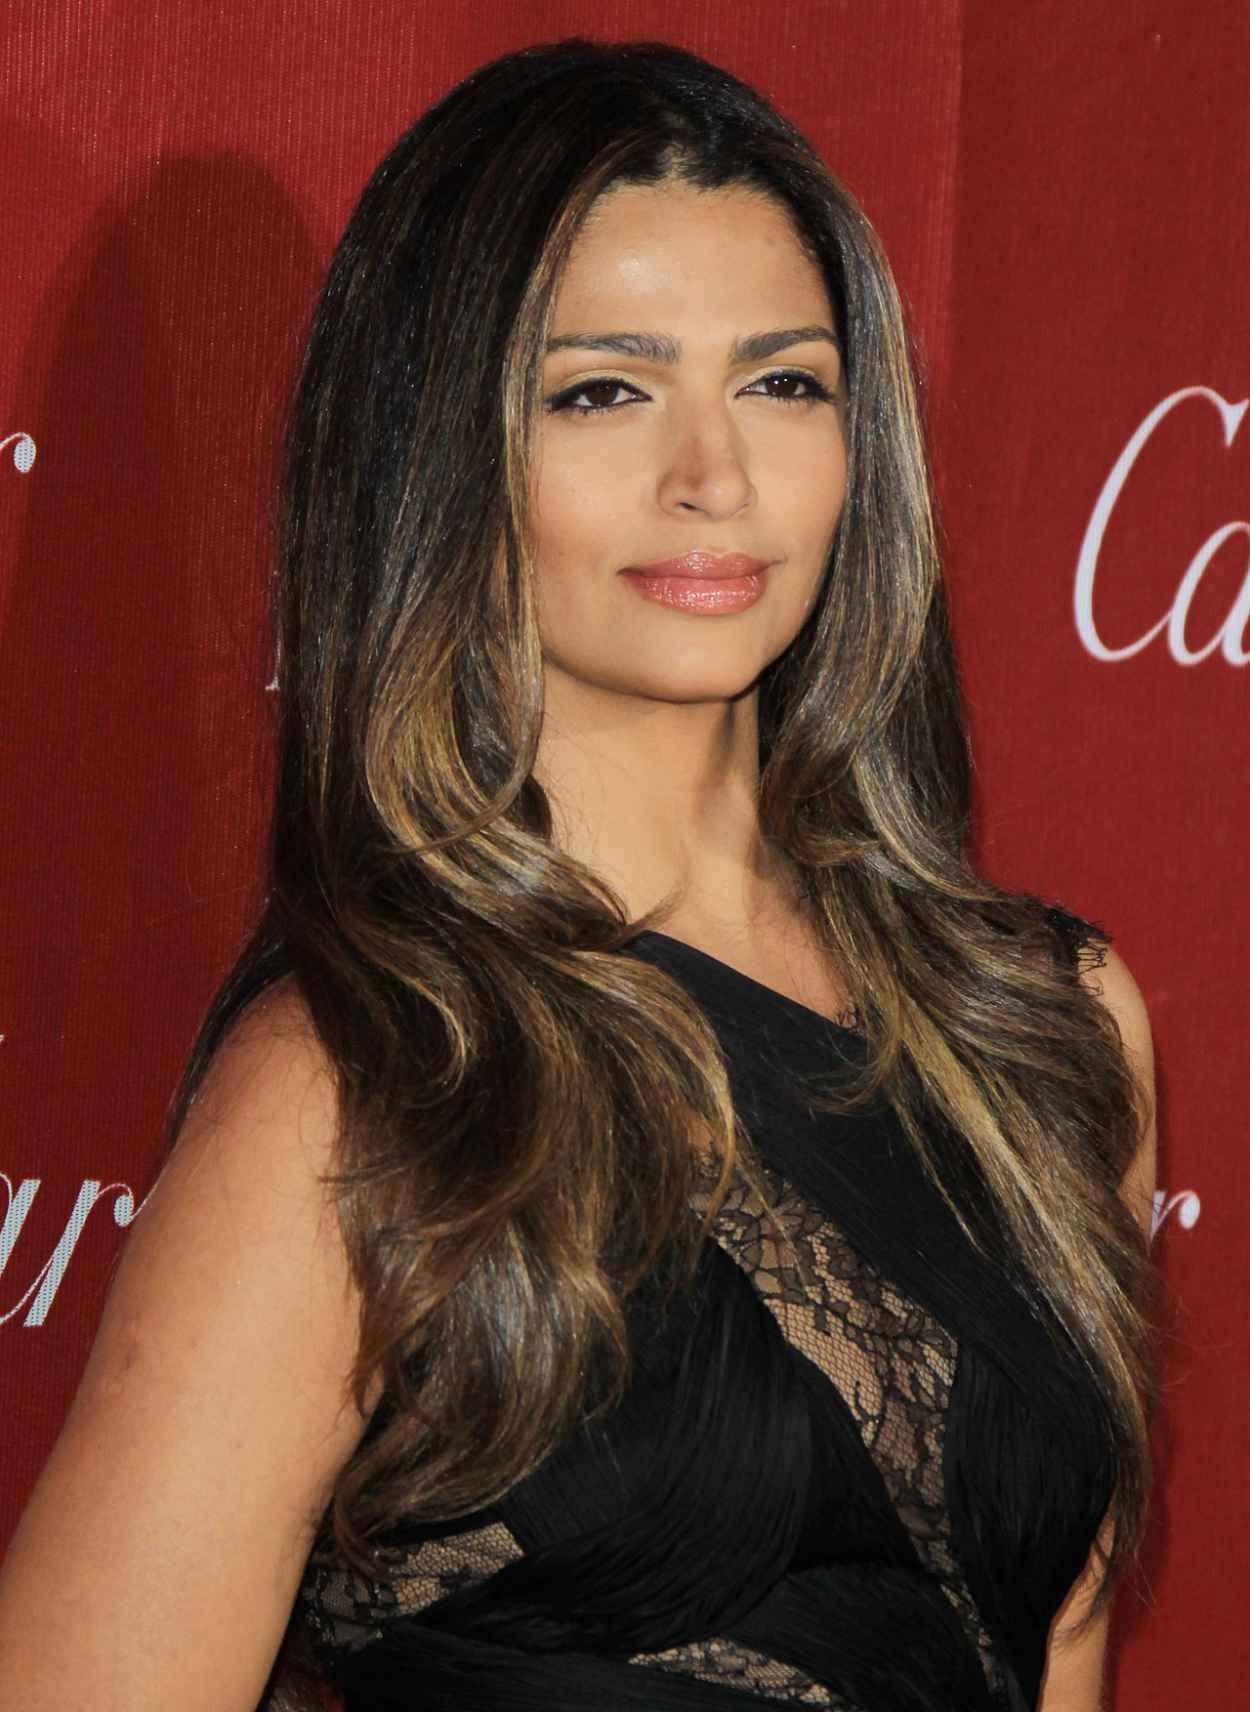 Camila Alves on Red Carpet - Palm Springs Film Festival Awards Gala (2014)-1